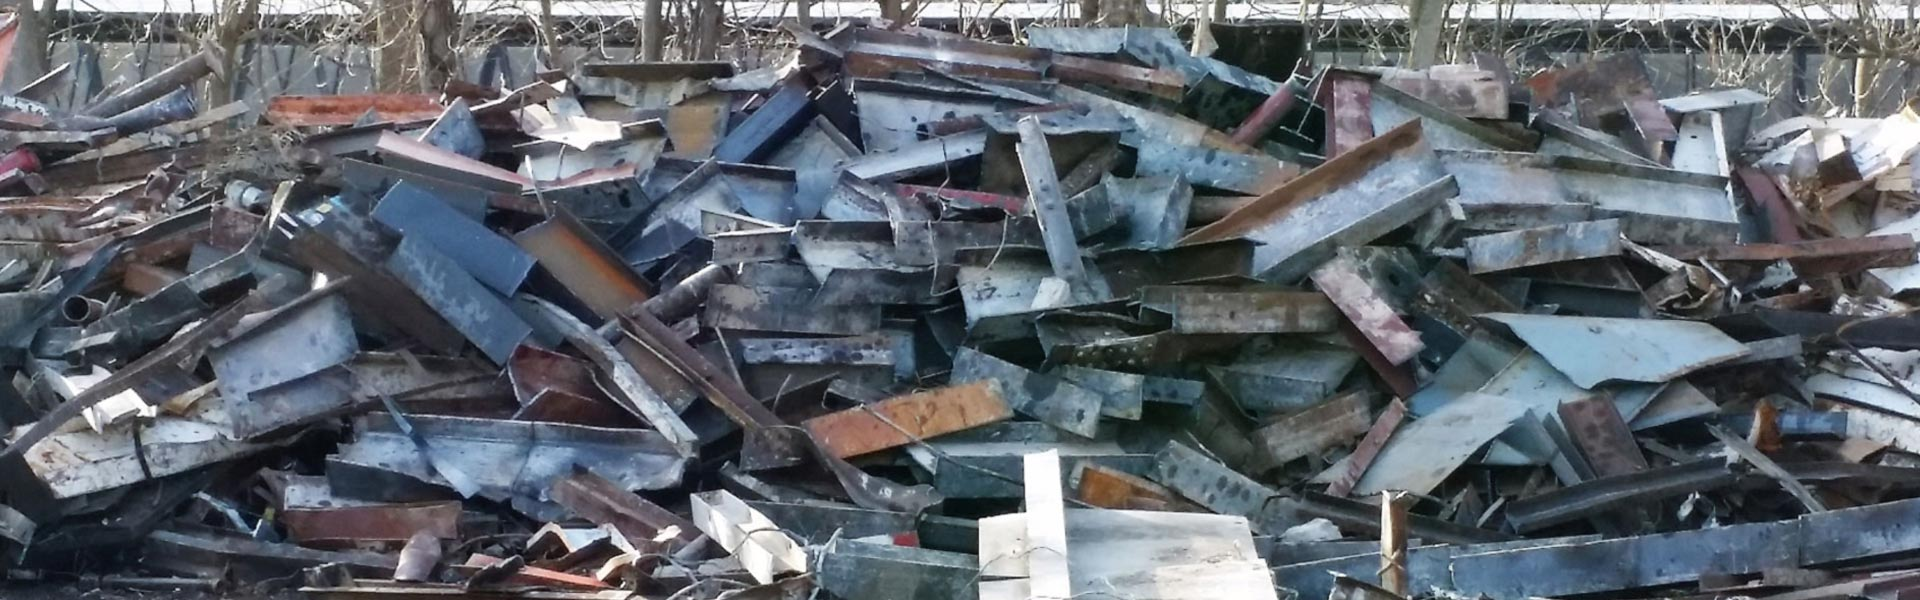 Modern Recycling Services Norristown Dumpster Rental Pa Norristown Scrap Metal Pennsylvania Norristown Pa Norristown Pennsylvania 19401 19404 19409 19415